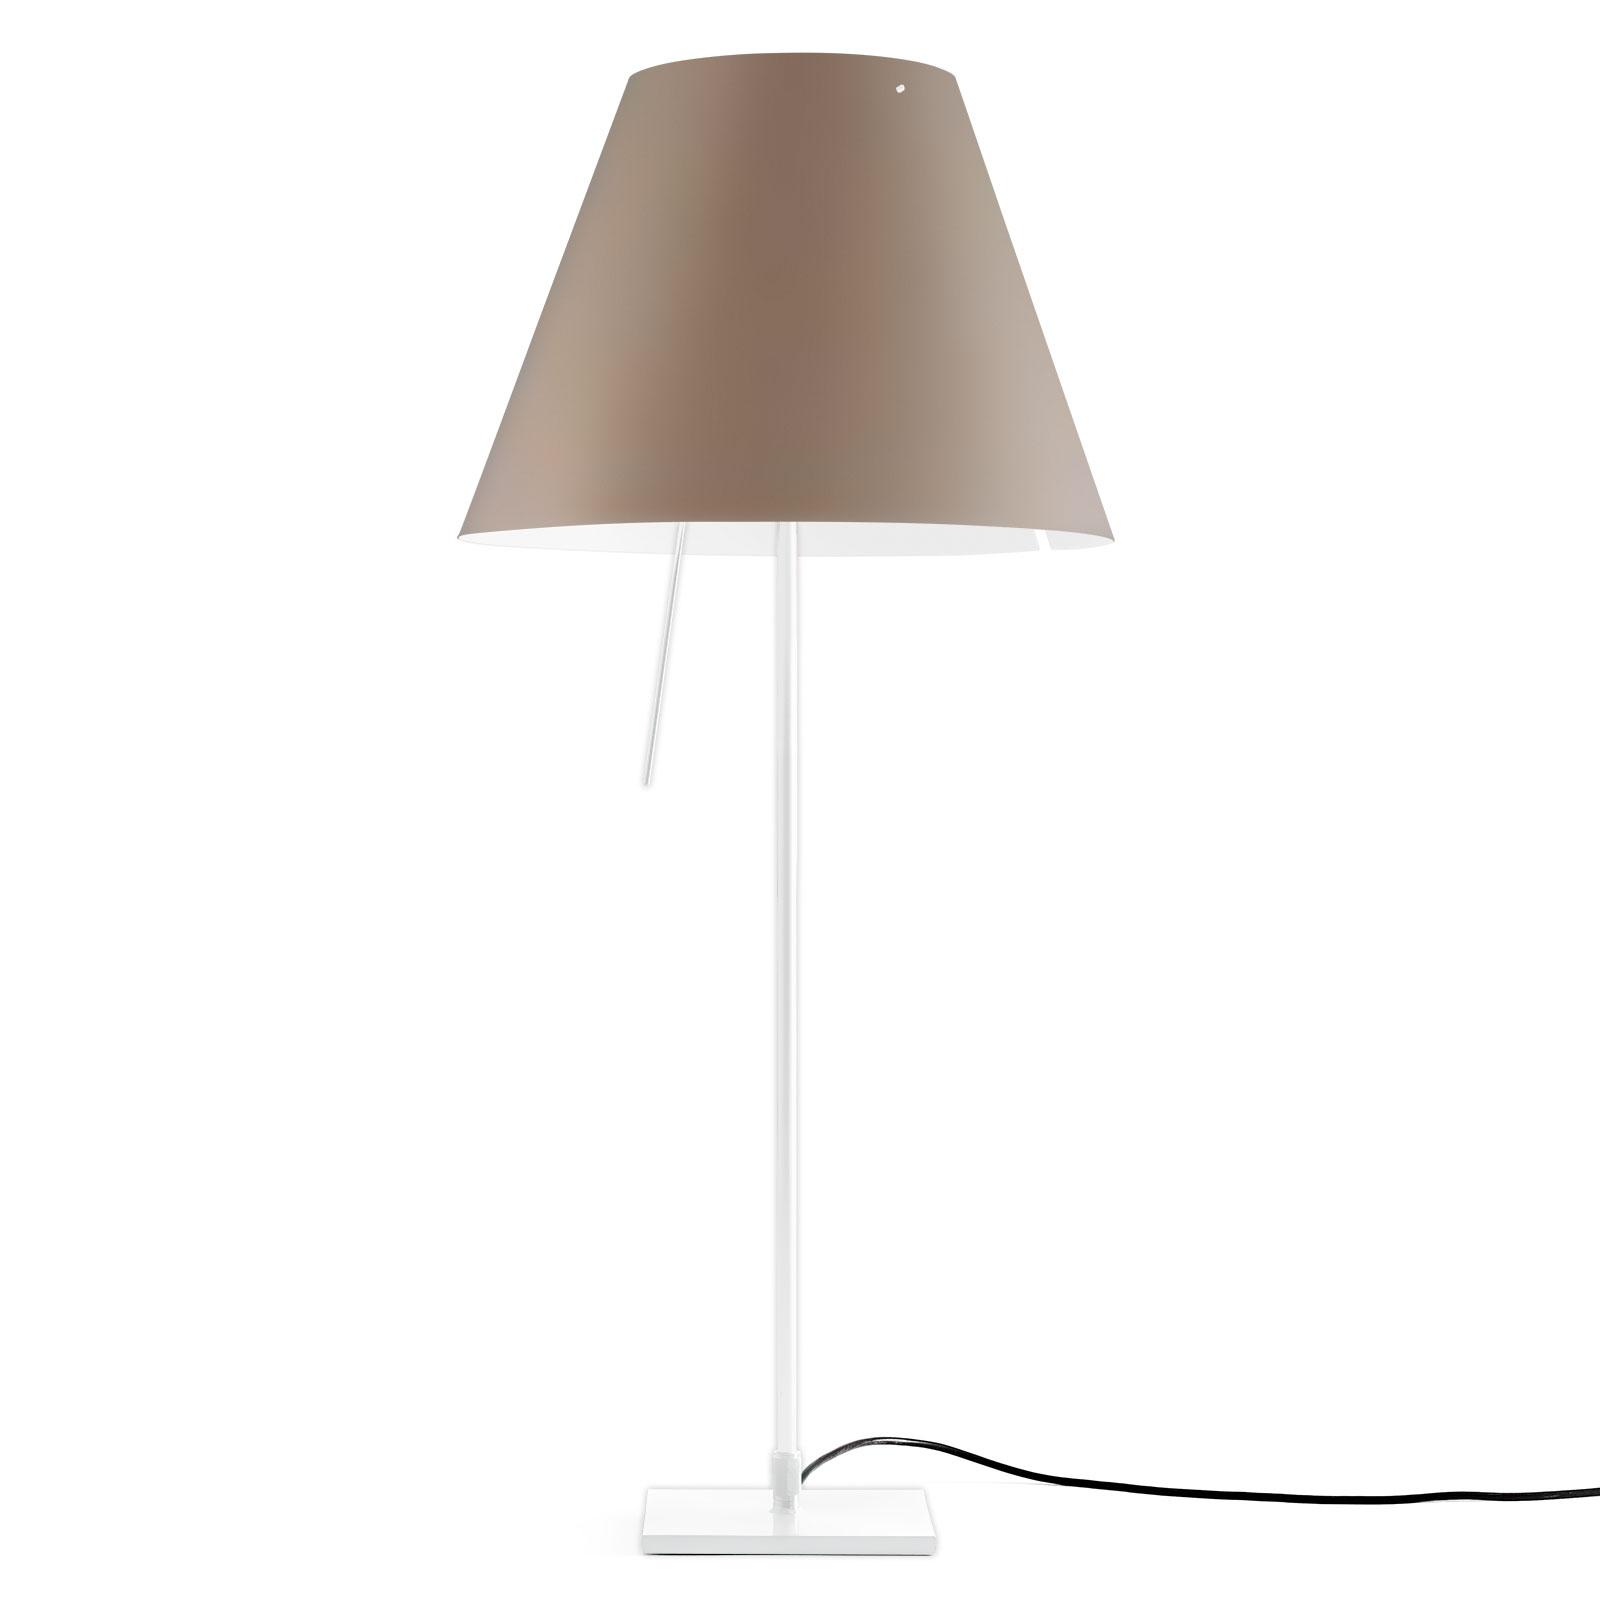 Luceplan Costanza tafellamp D13if wit/noga